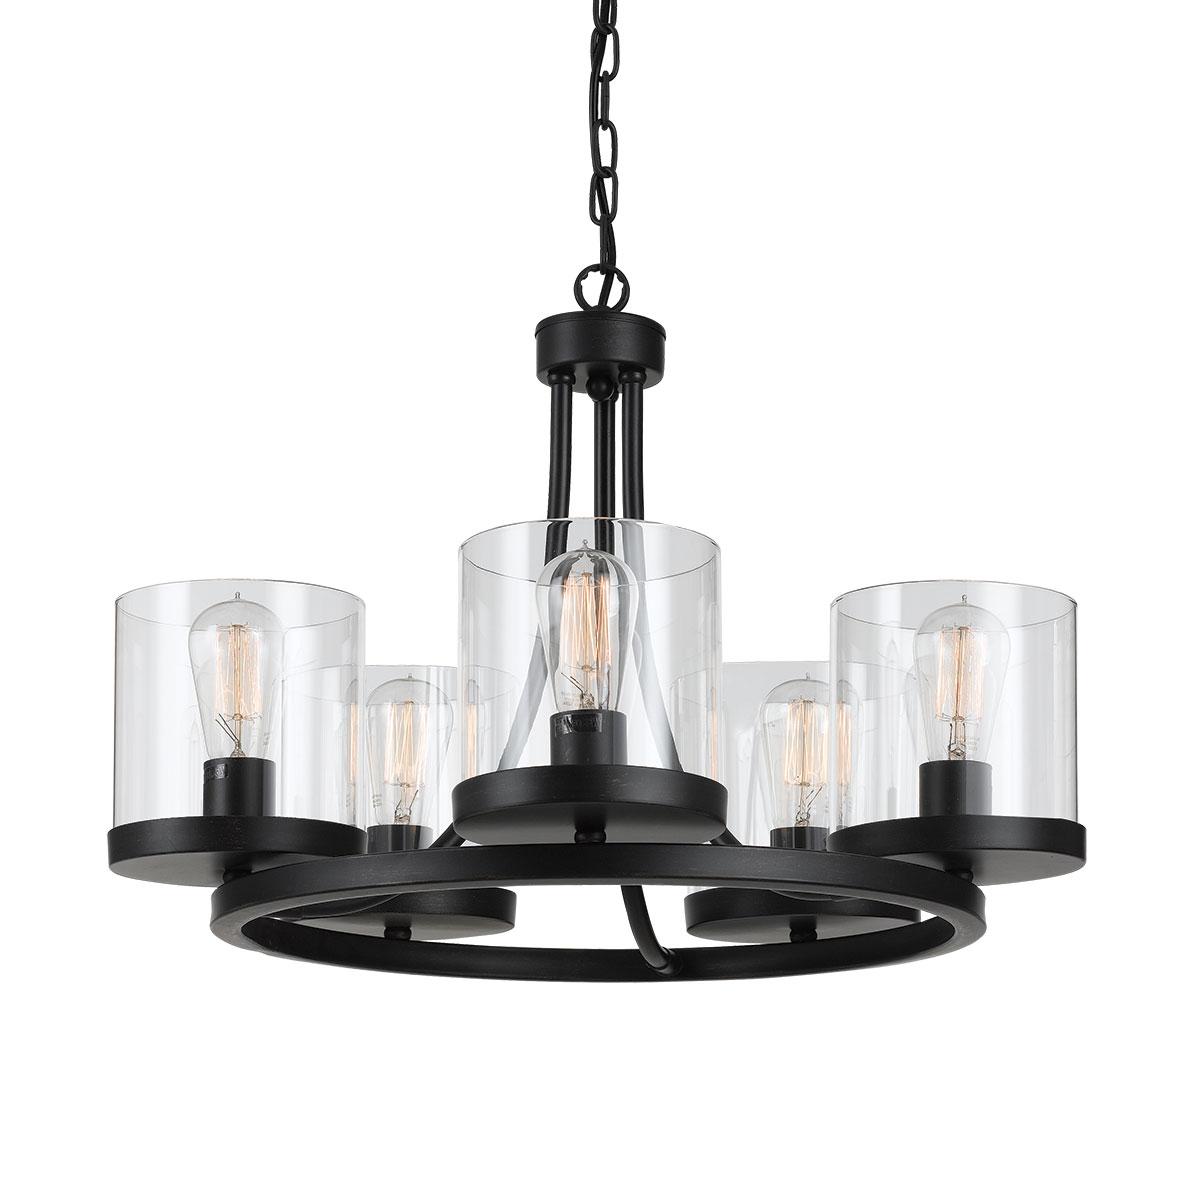 Largo 5 light small chandelier online lighting largo 5 light small chandelier aloadofball Images